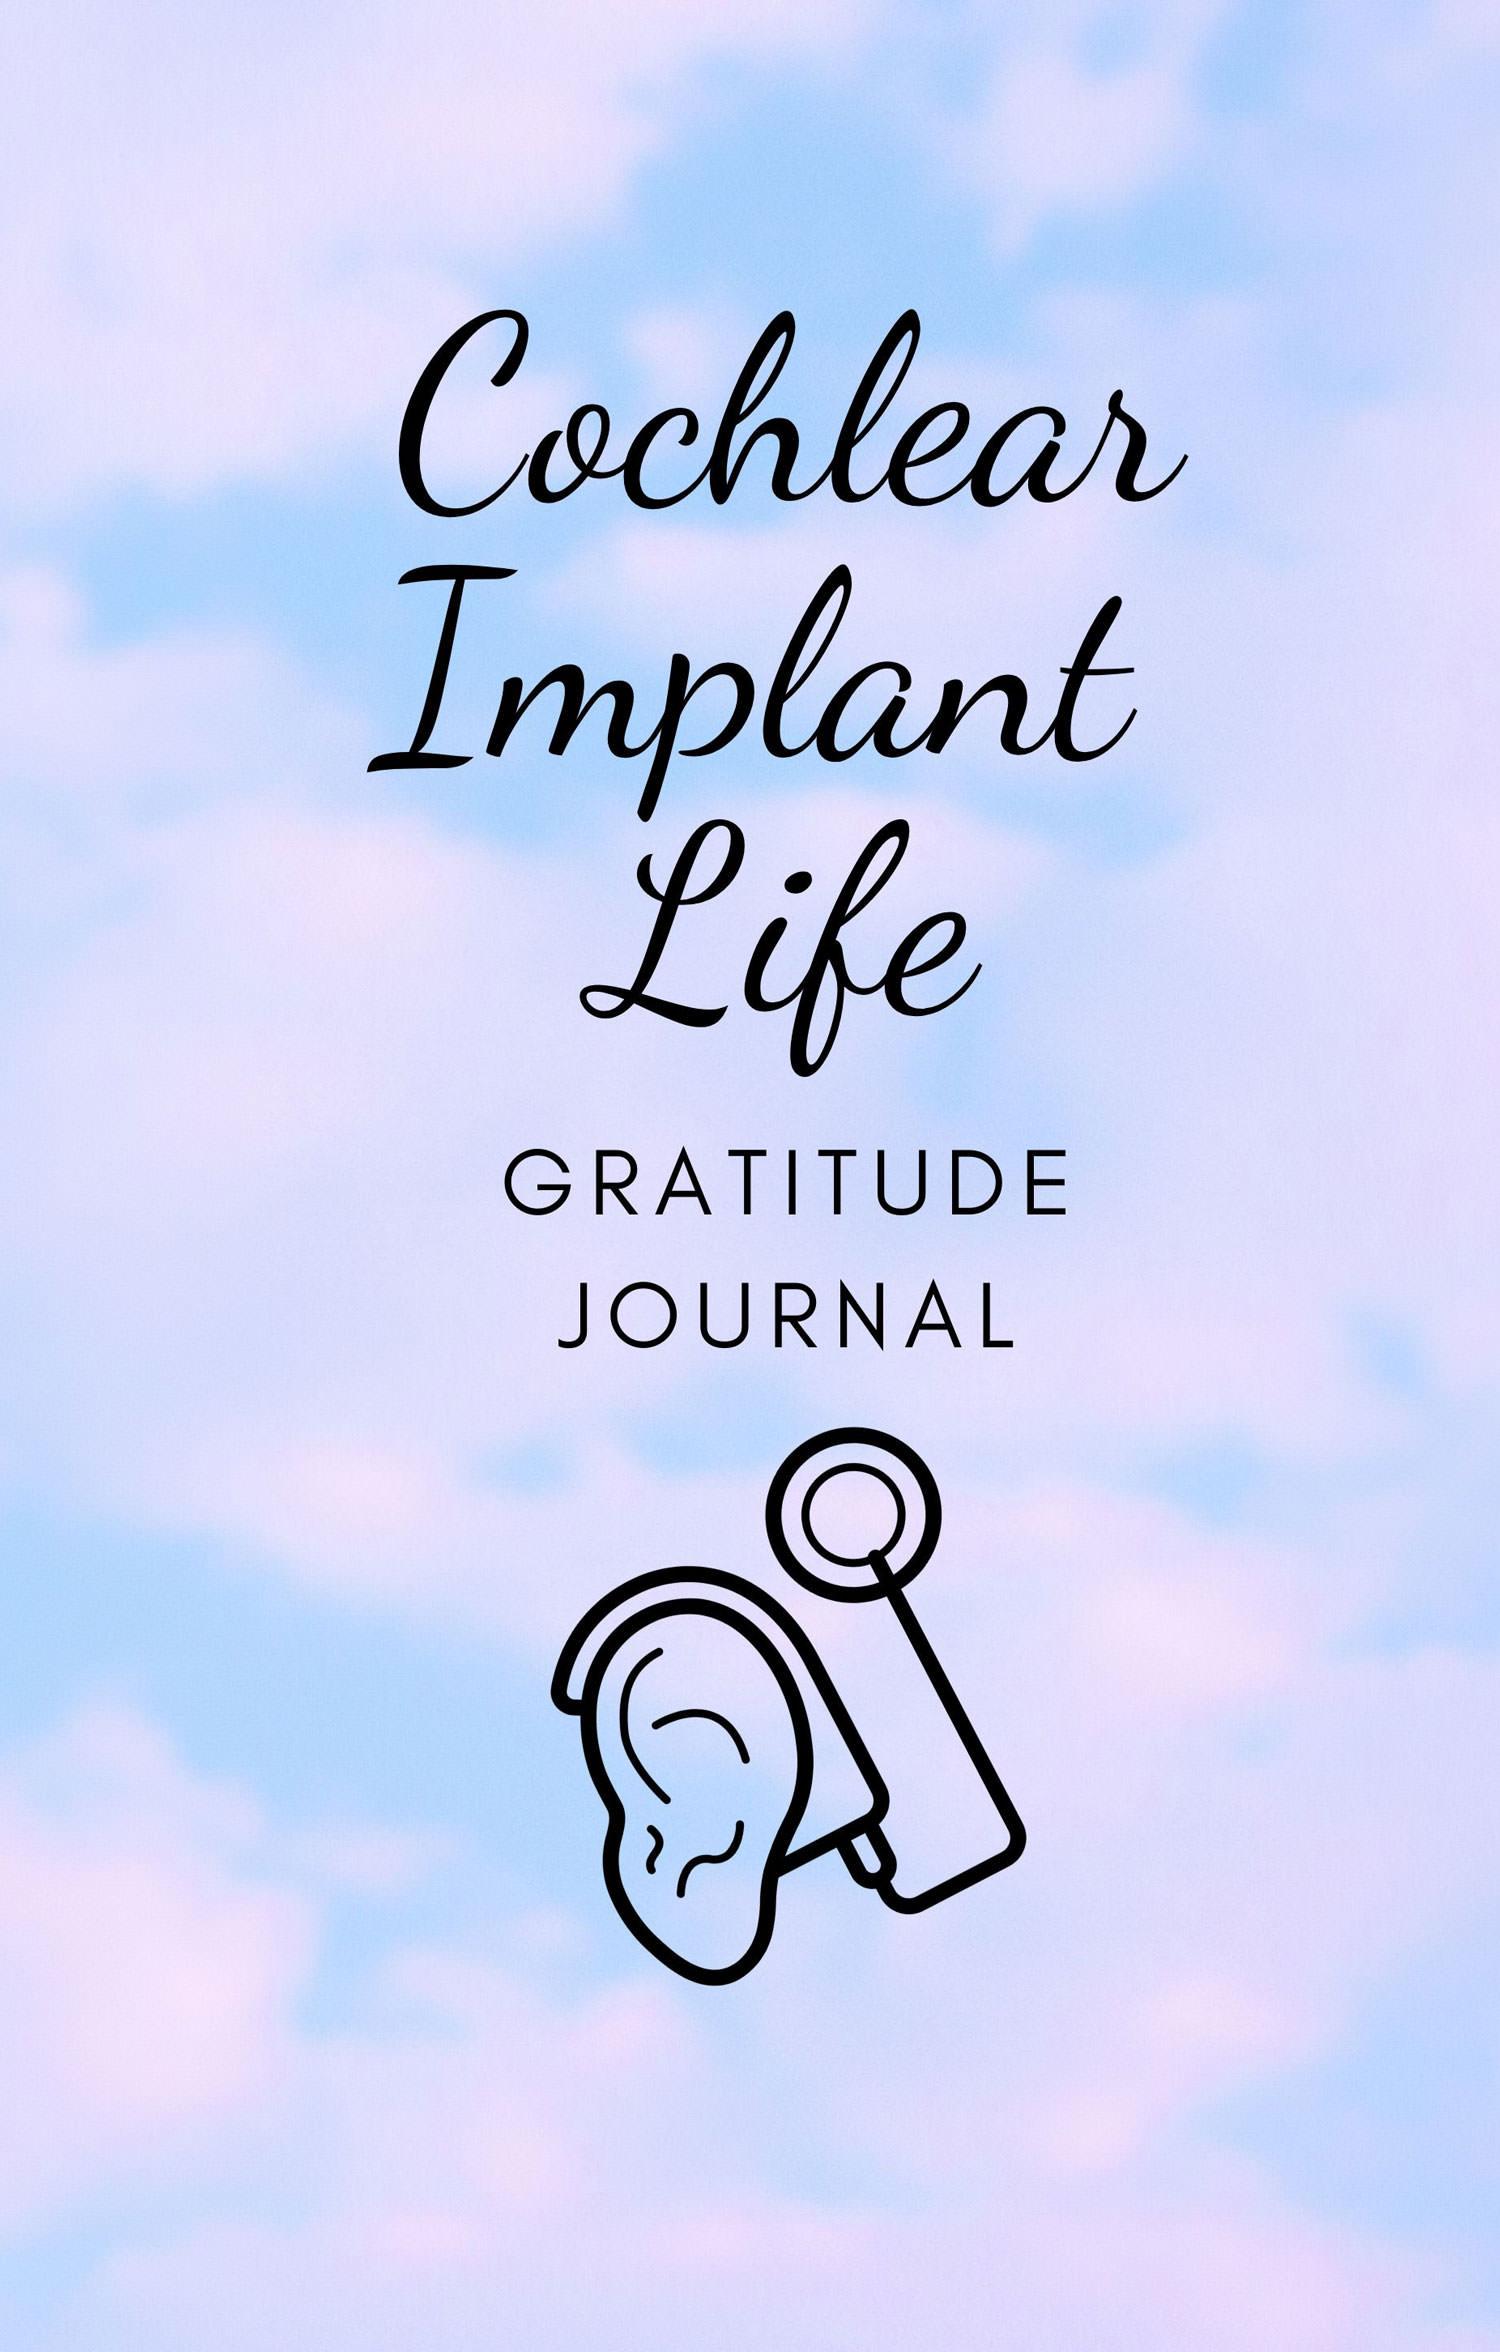 web_front_cover_gratitude copy.jpg